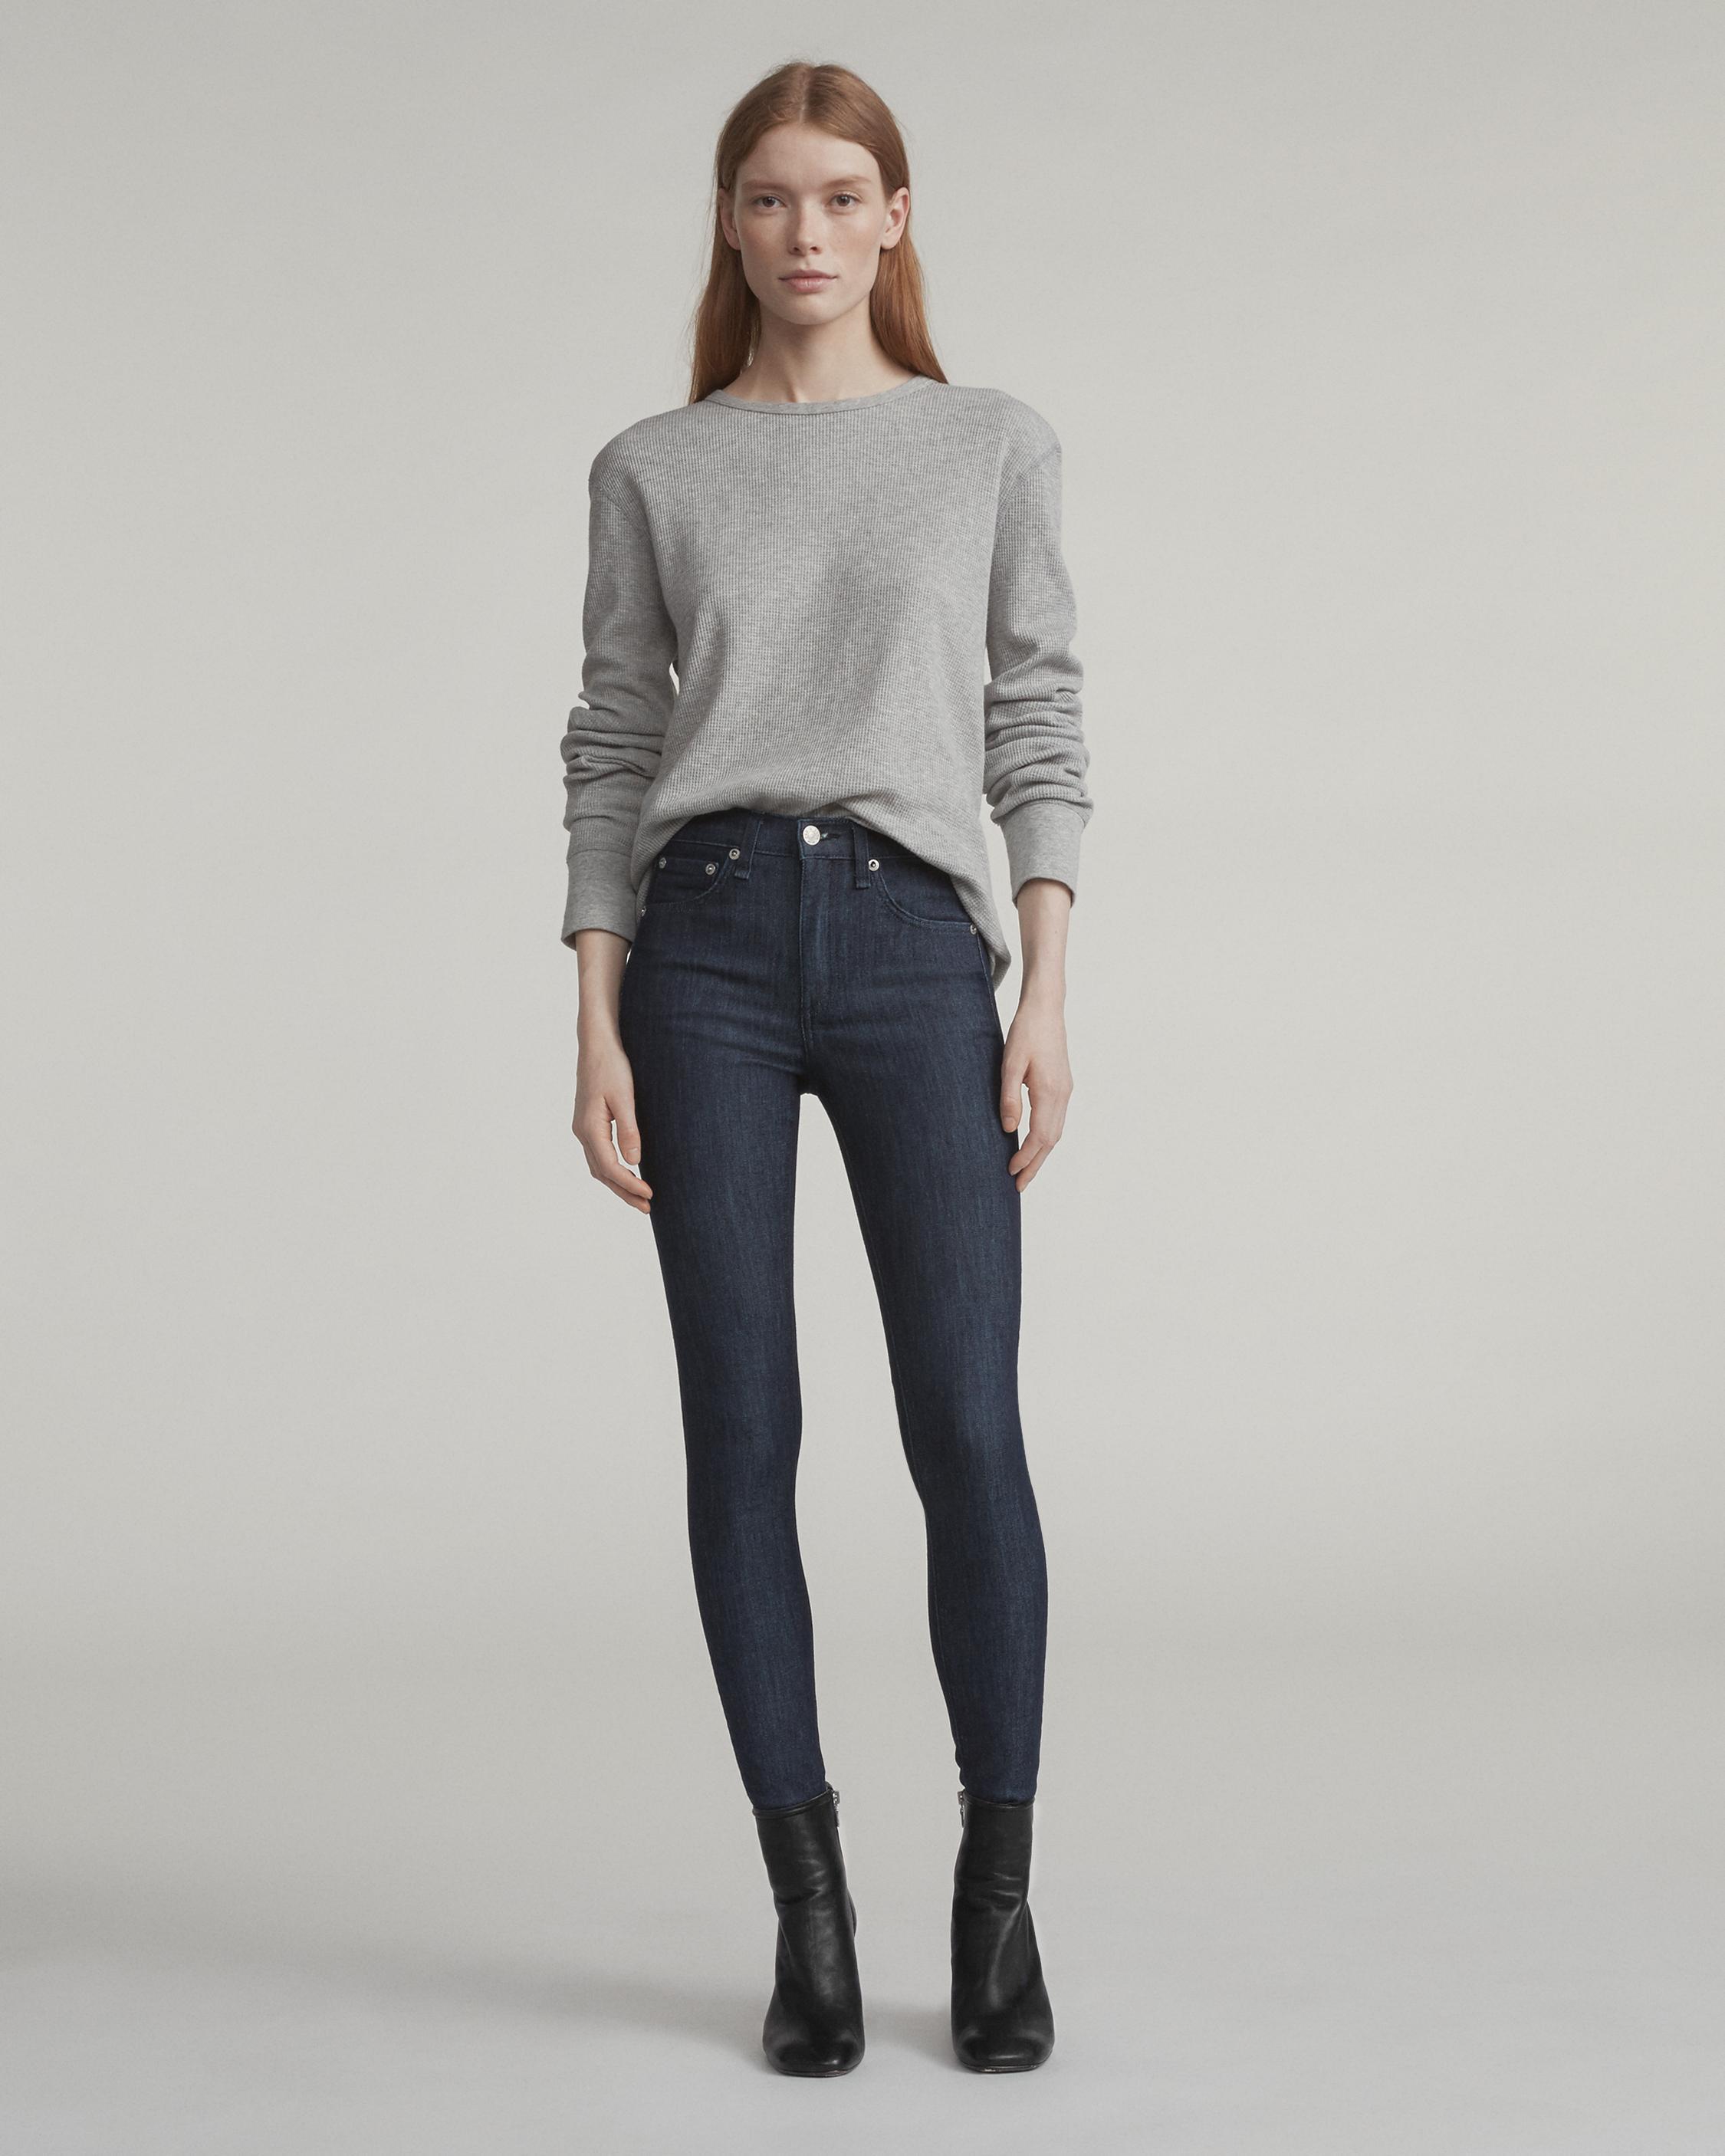 55611594c3b0e Womens Heritage Jeans - Iconic Urban Style   rag   bone